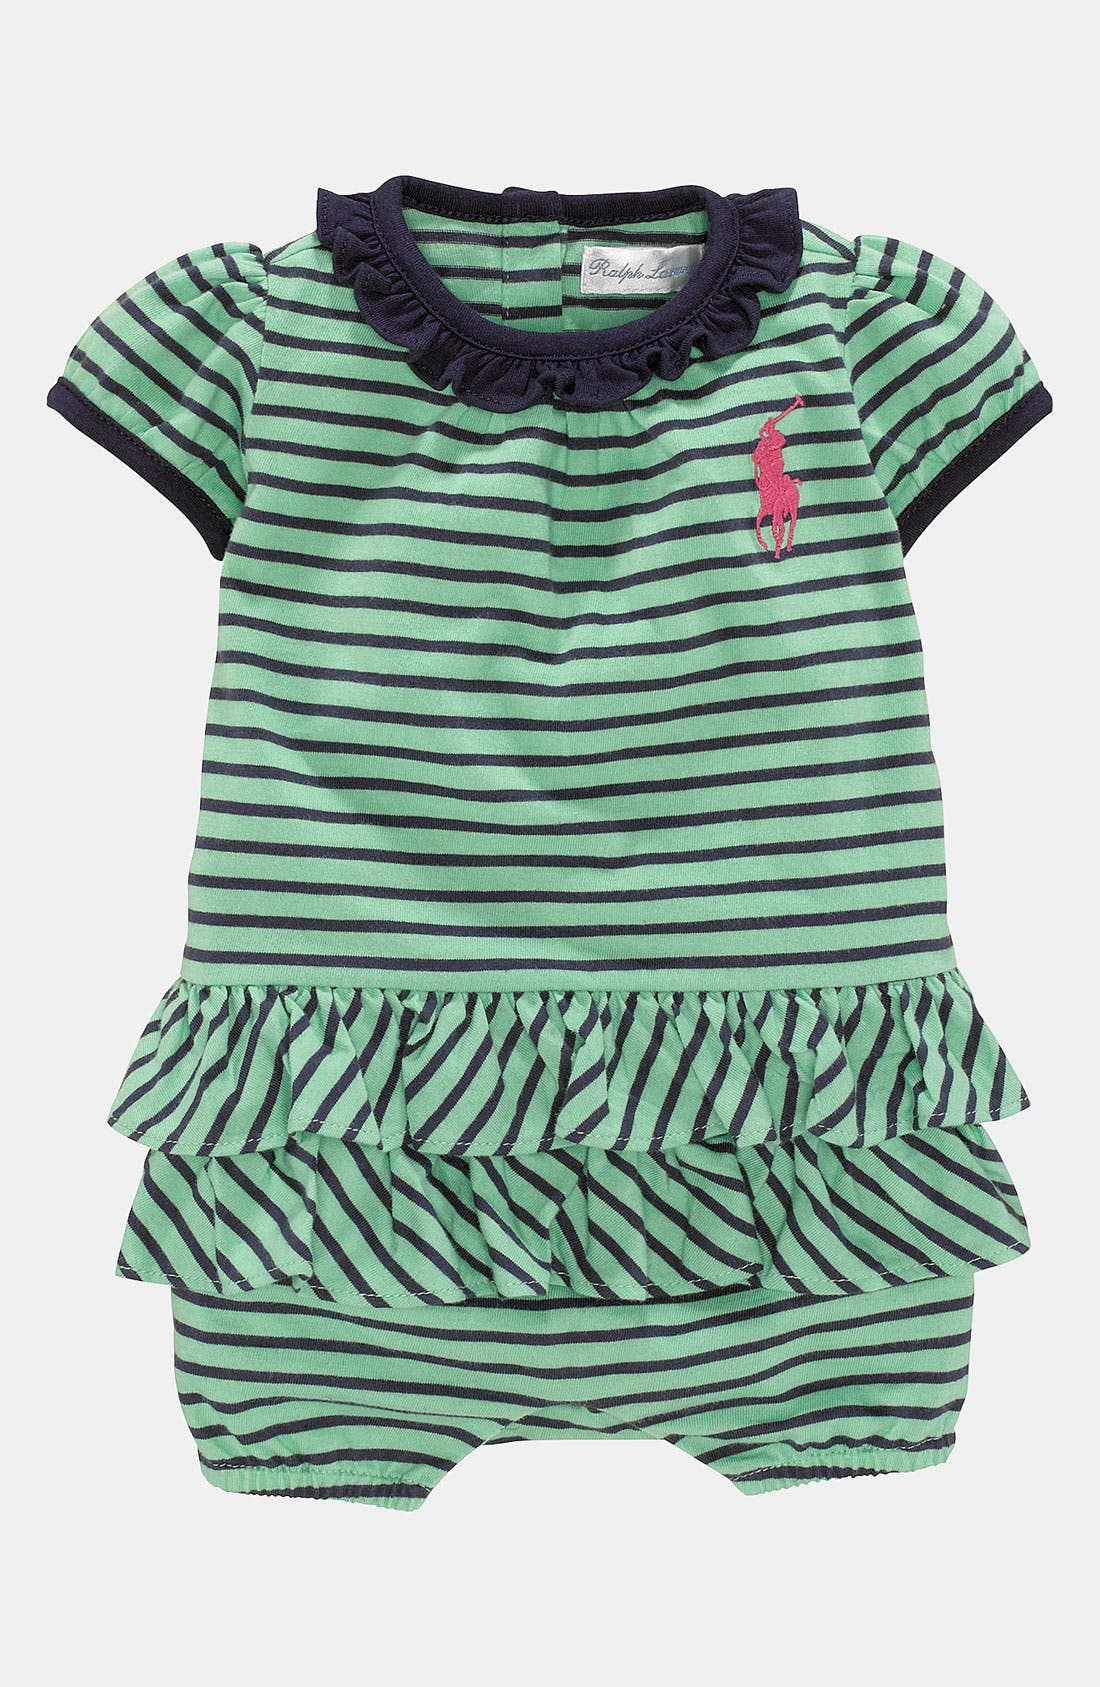 Main Image - Ralph Lauren Stripe Bodysuit (Infant)